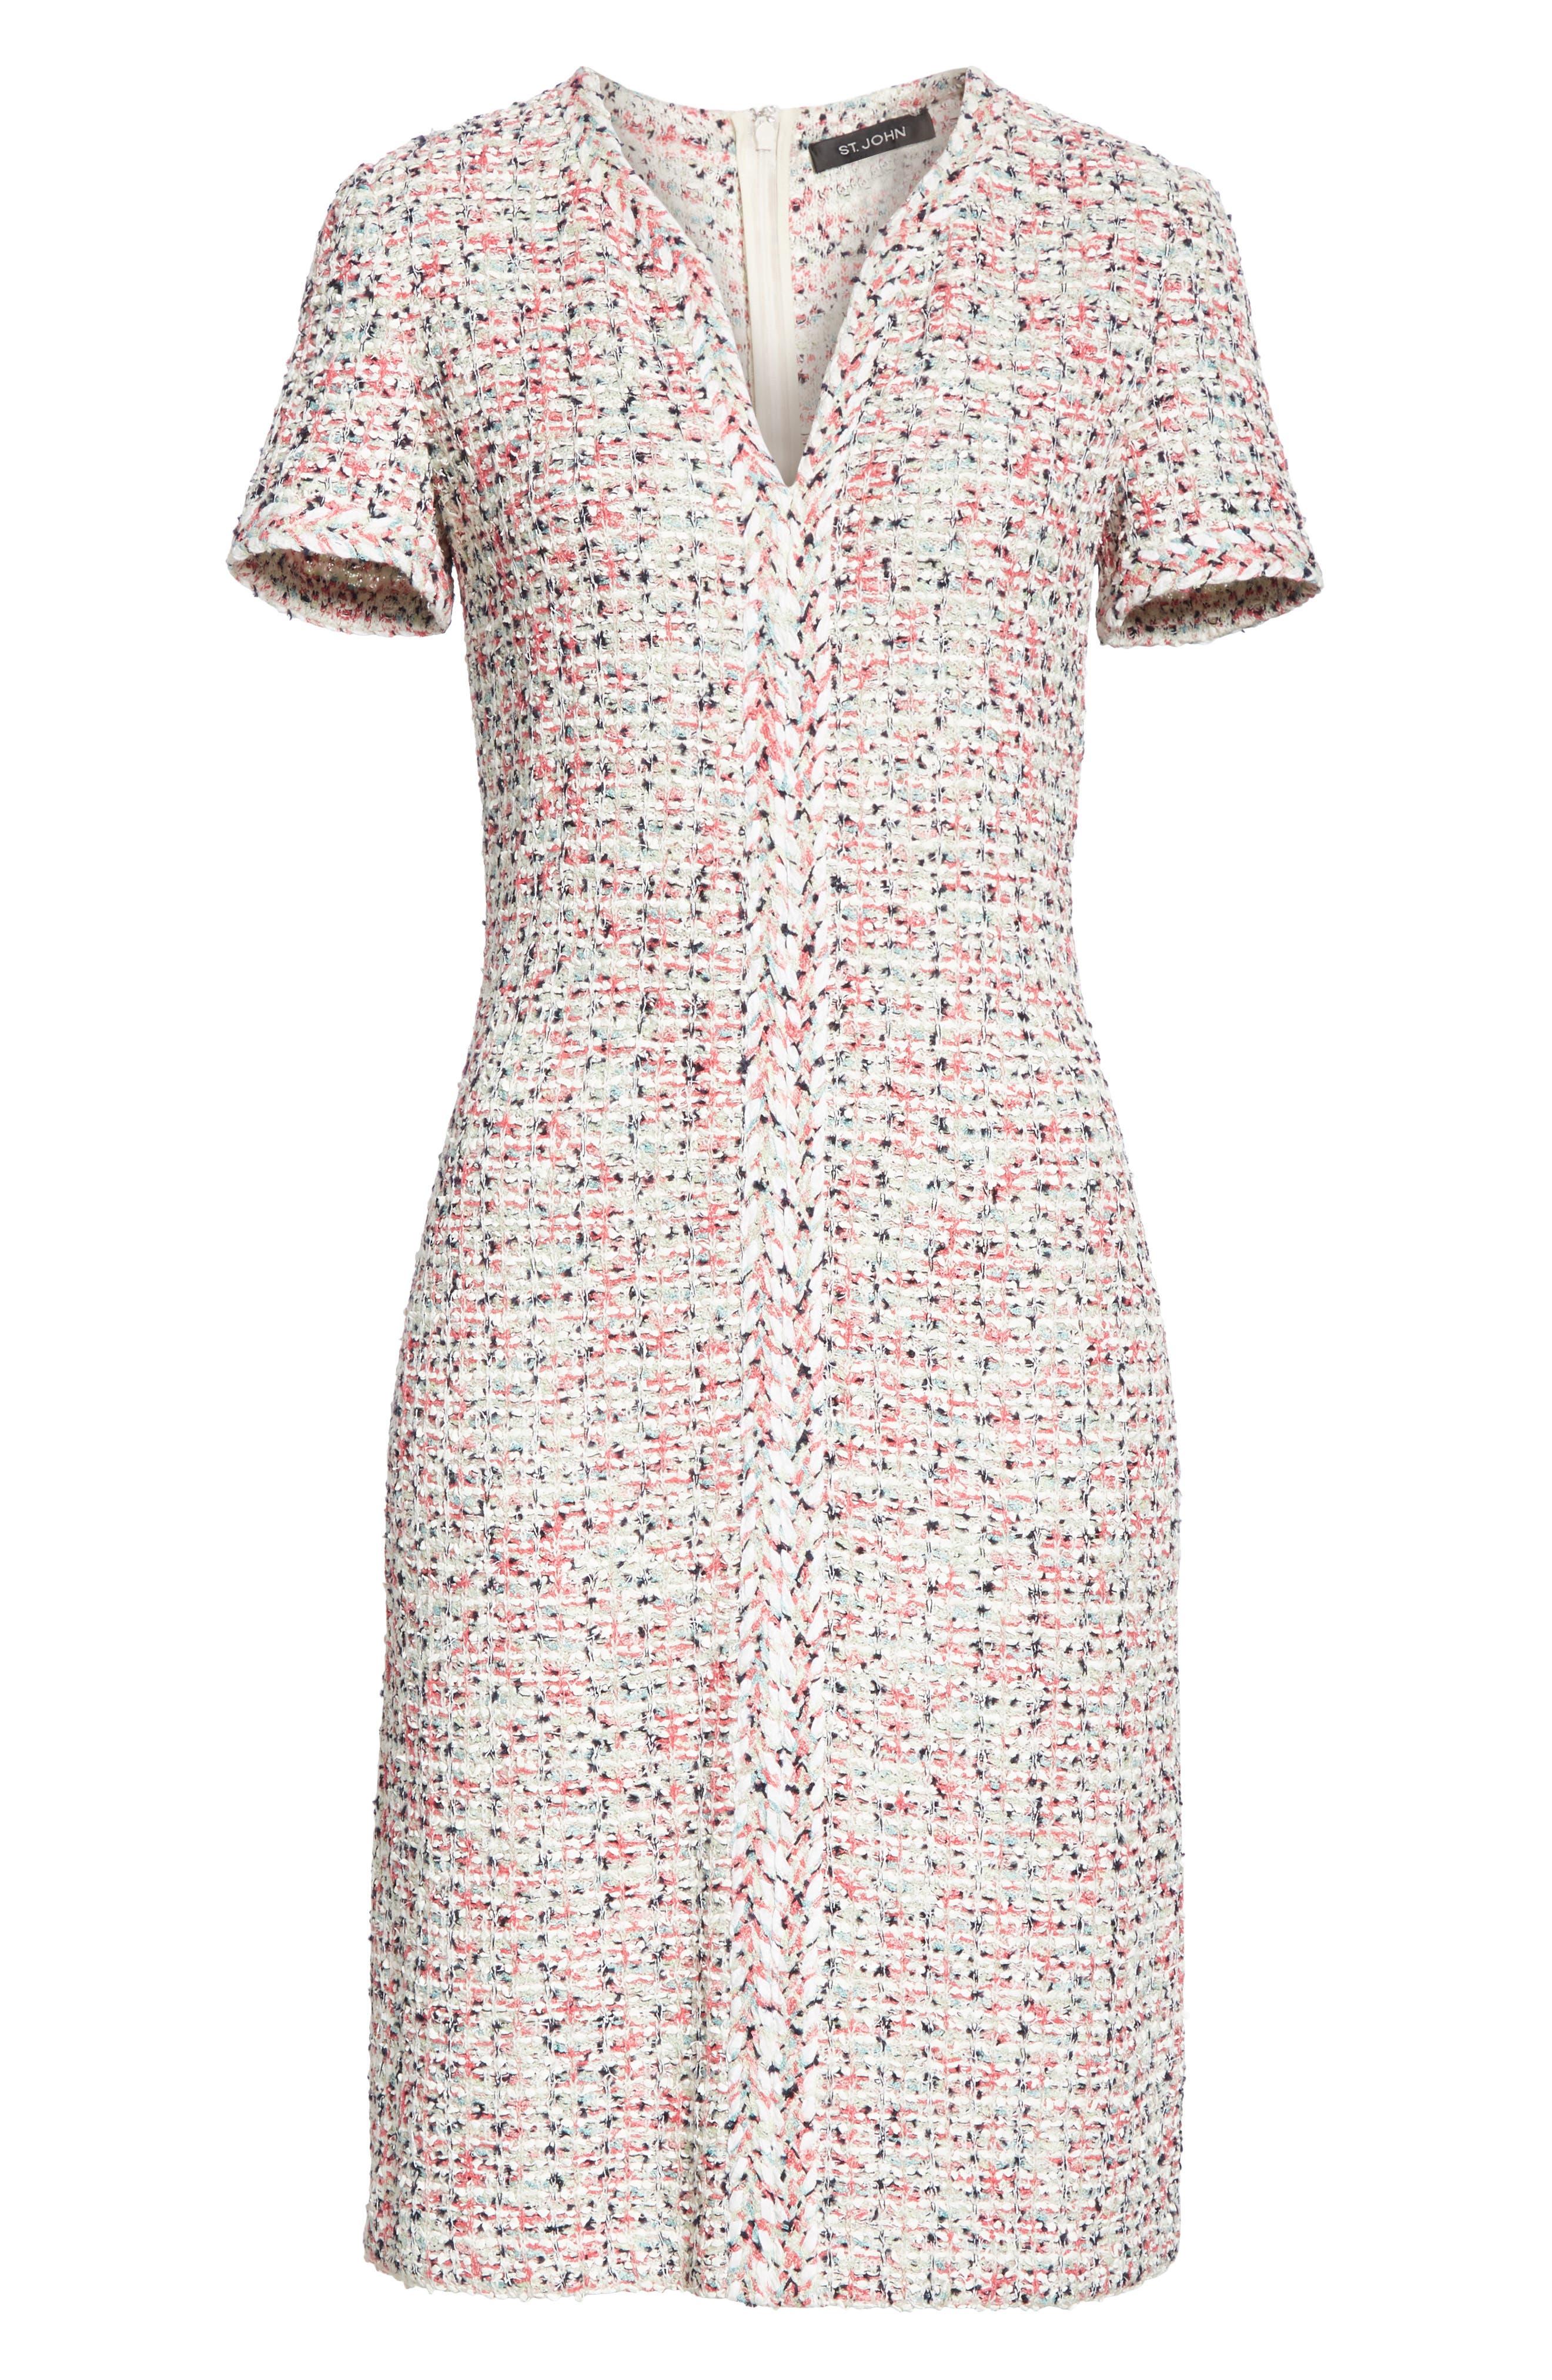 Modern Knit Dress,                             Alternate thumbnail 7, color,                             CREAM MULTI